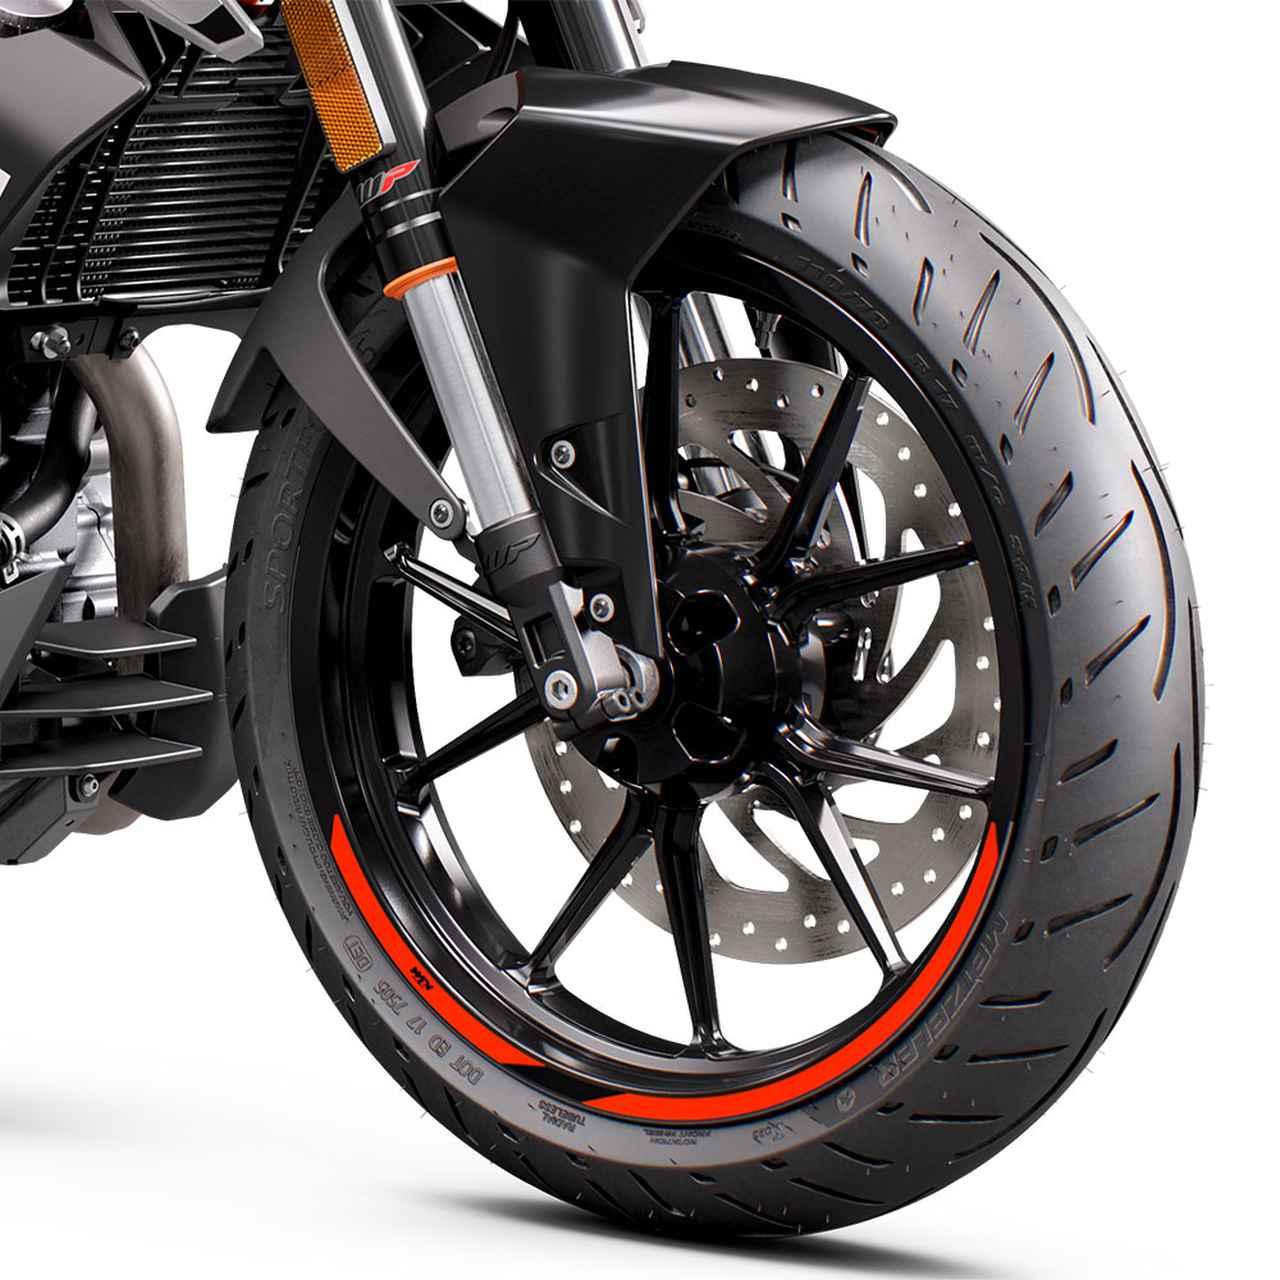 Images : 14番目の画像 - 【写真20枚】KTM「250 デューク」 - webオートバイ